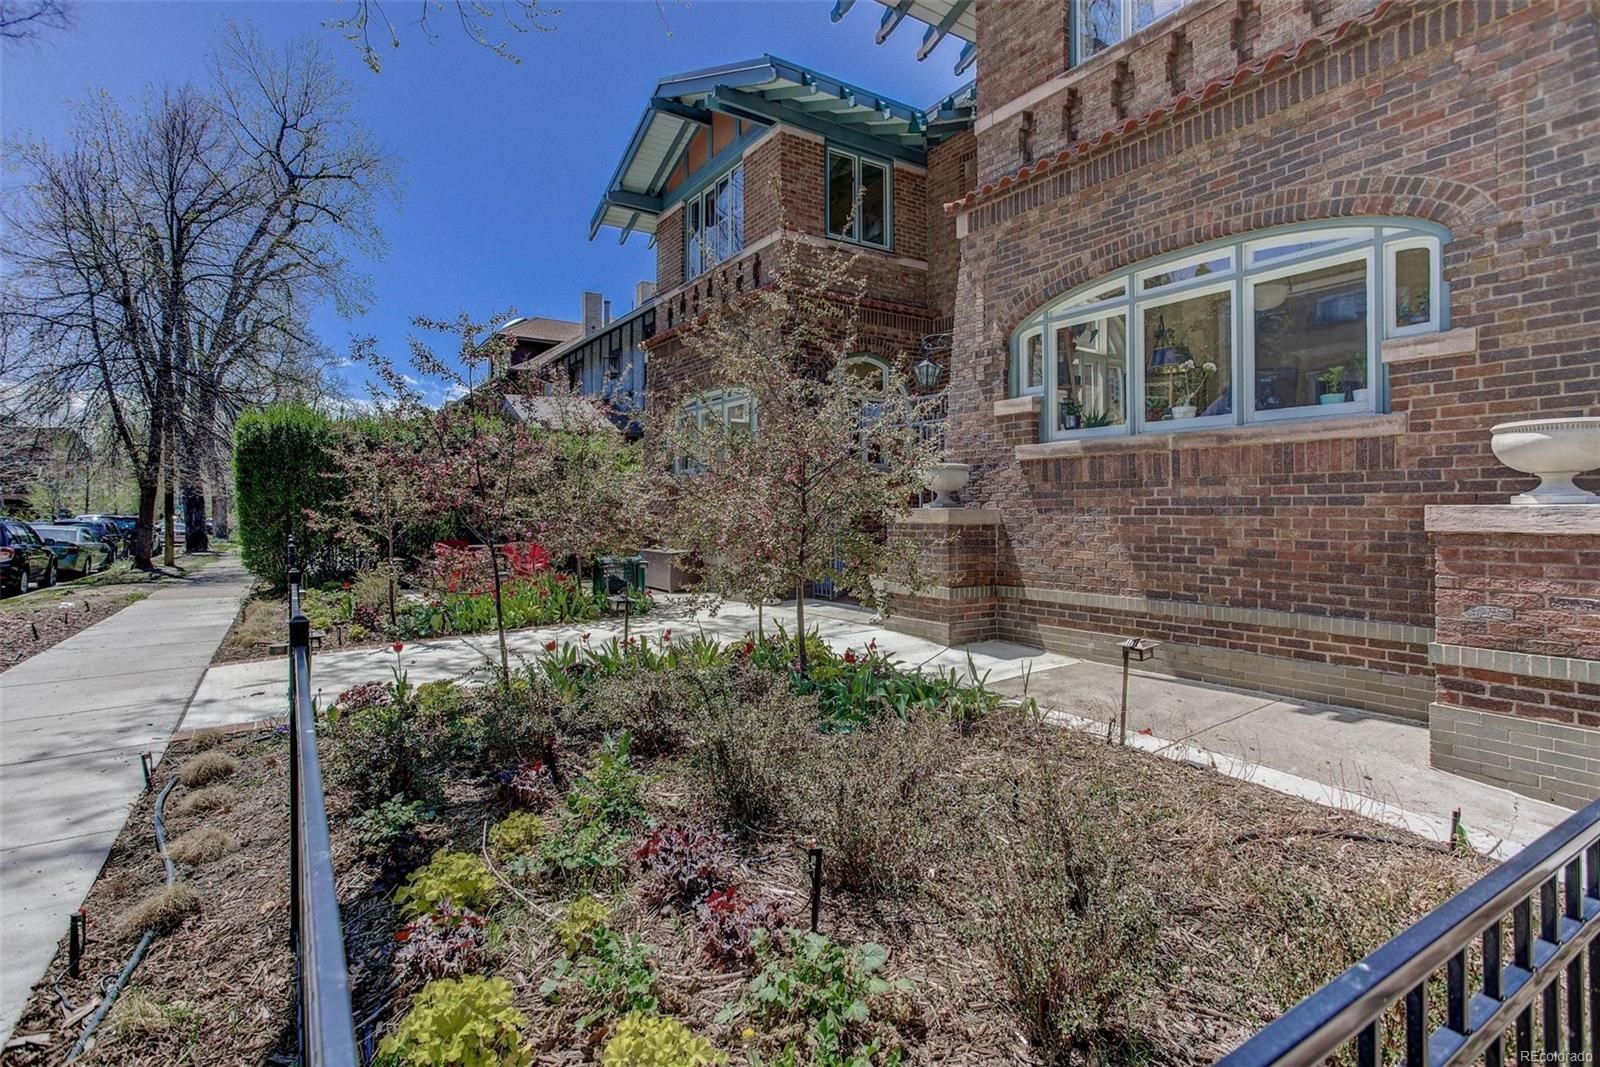 MLS# 2861817 - 1 - 861  N Humboldt Street, Denver, CO 80218